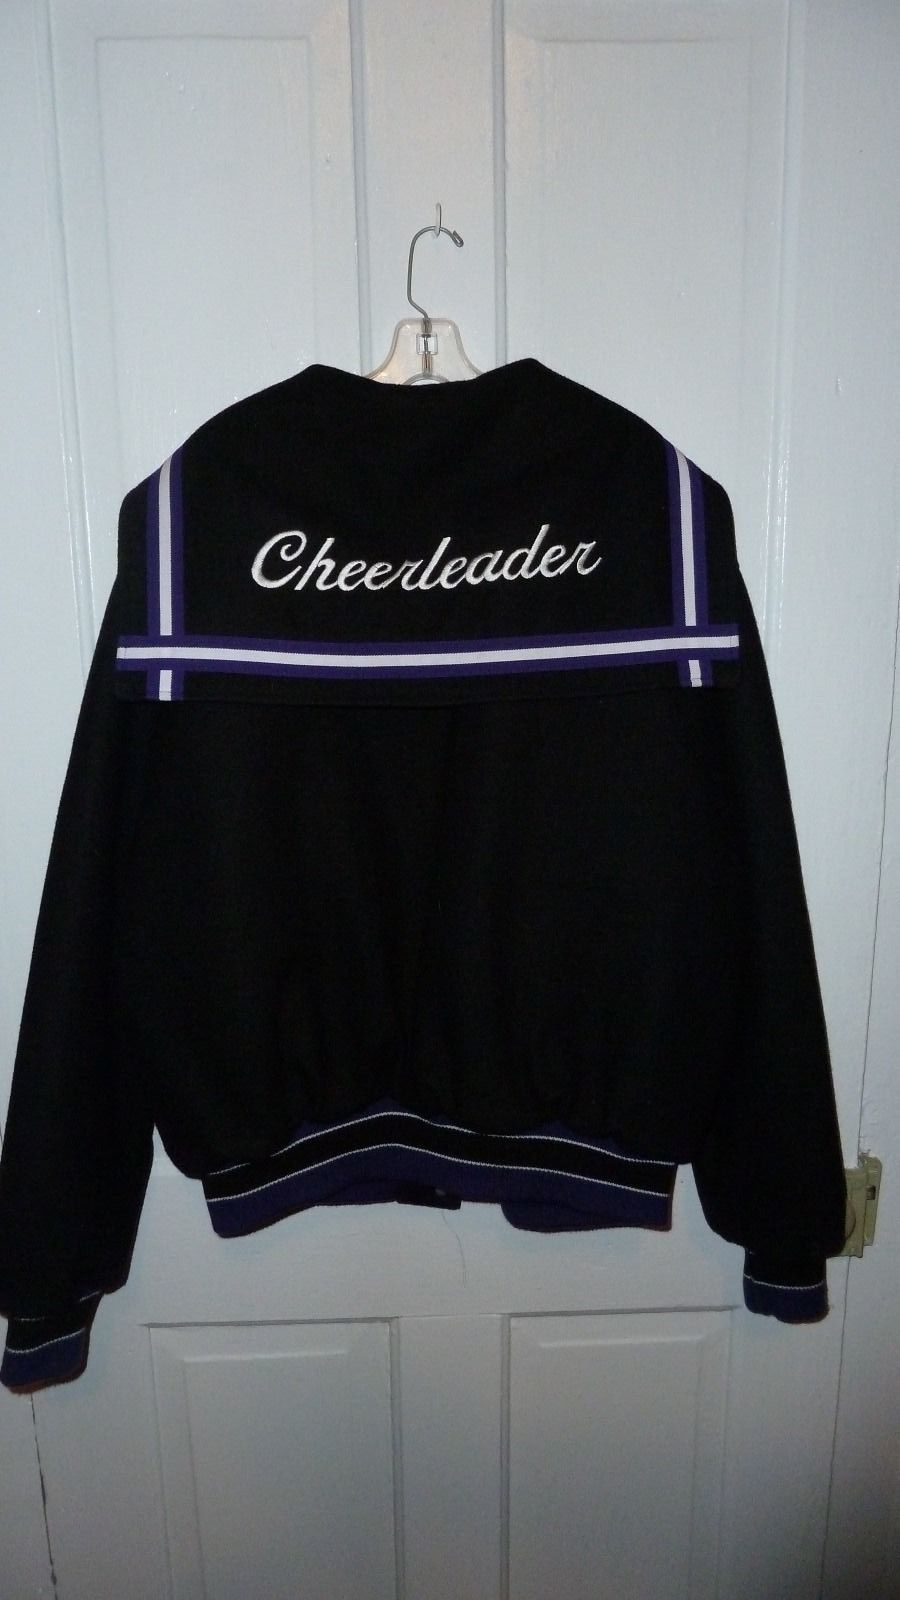 Rennoc classic womenus lettermanus jacket xl black purple white